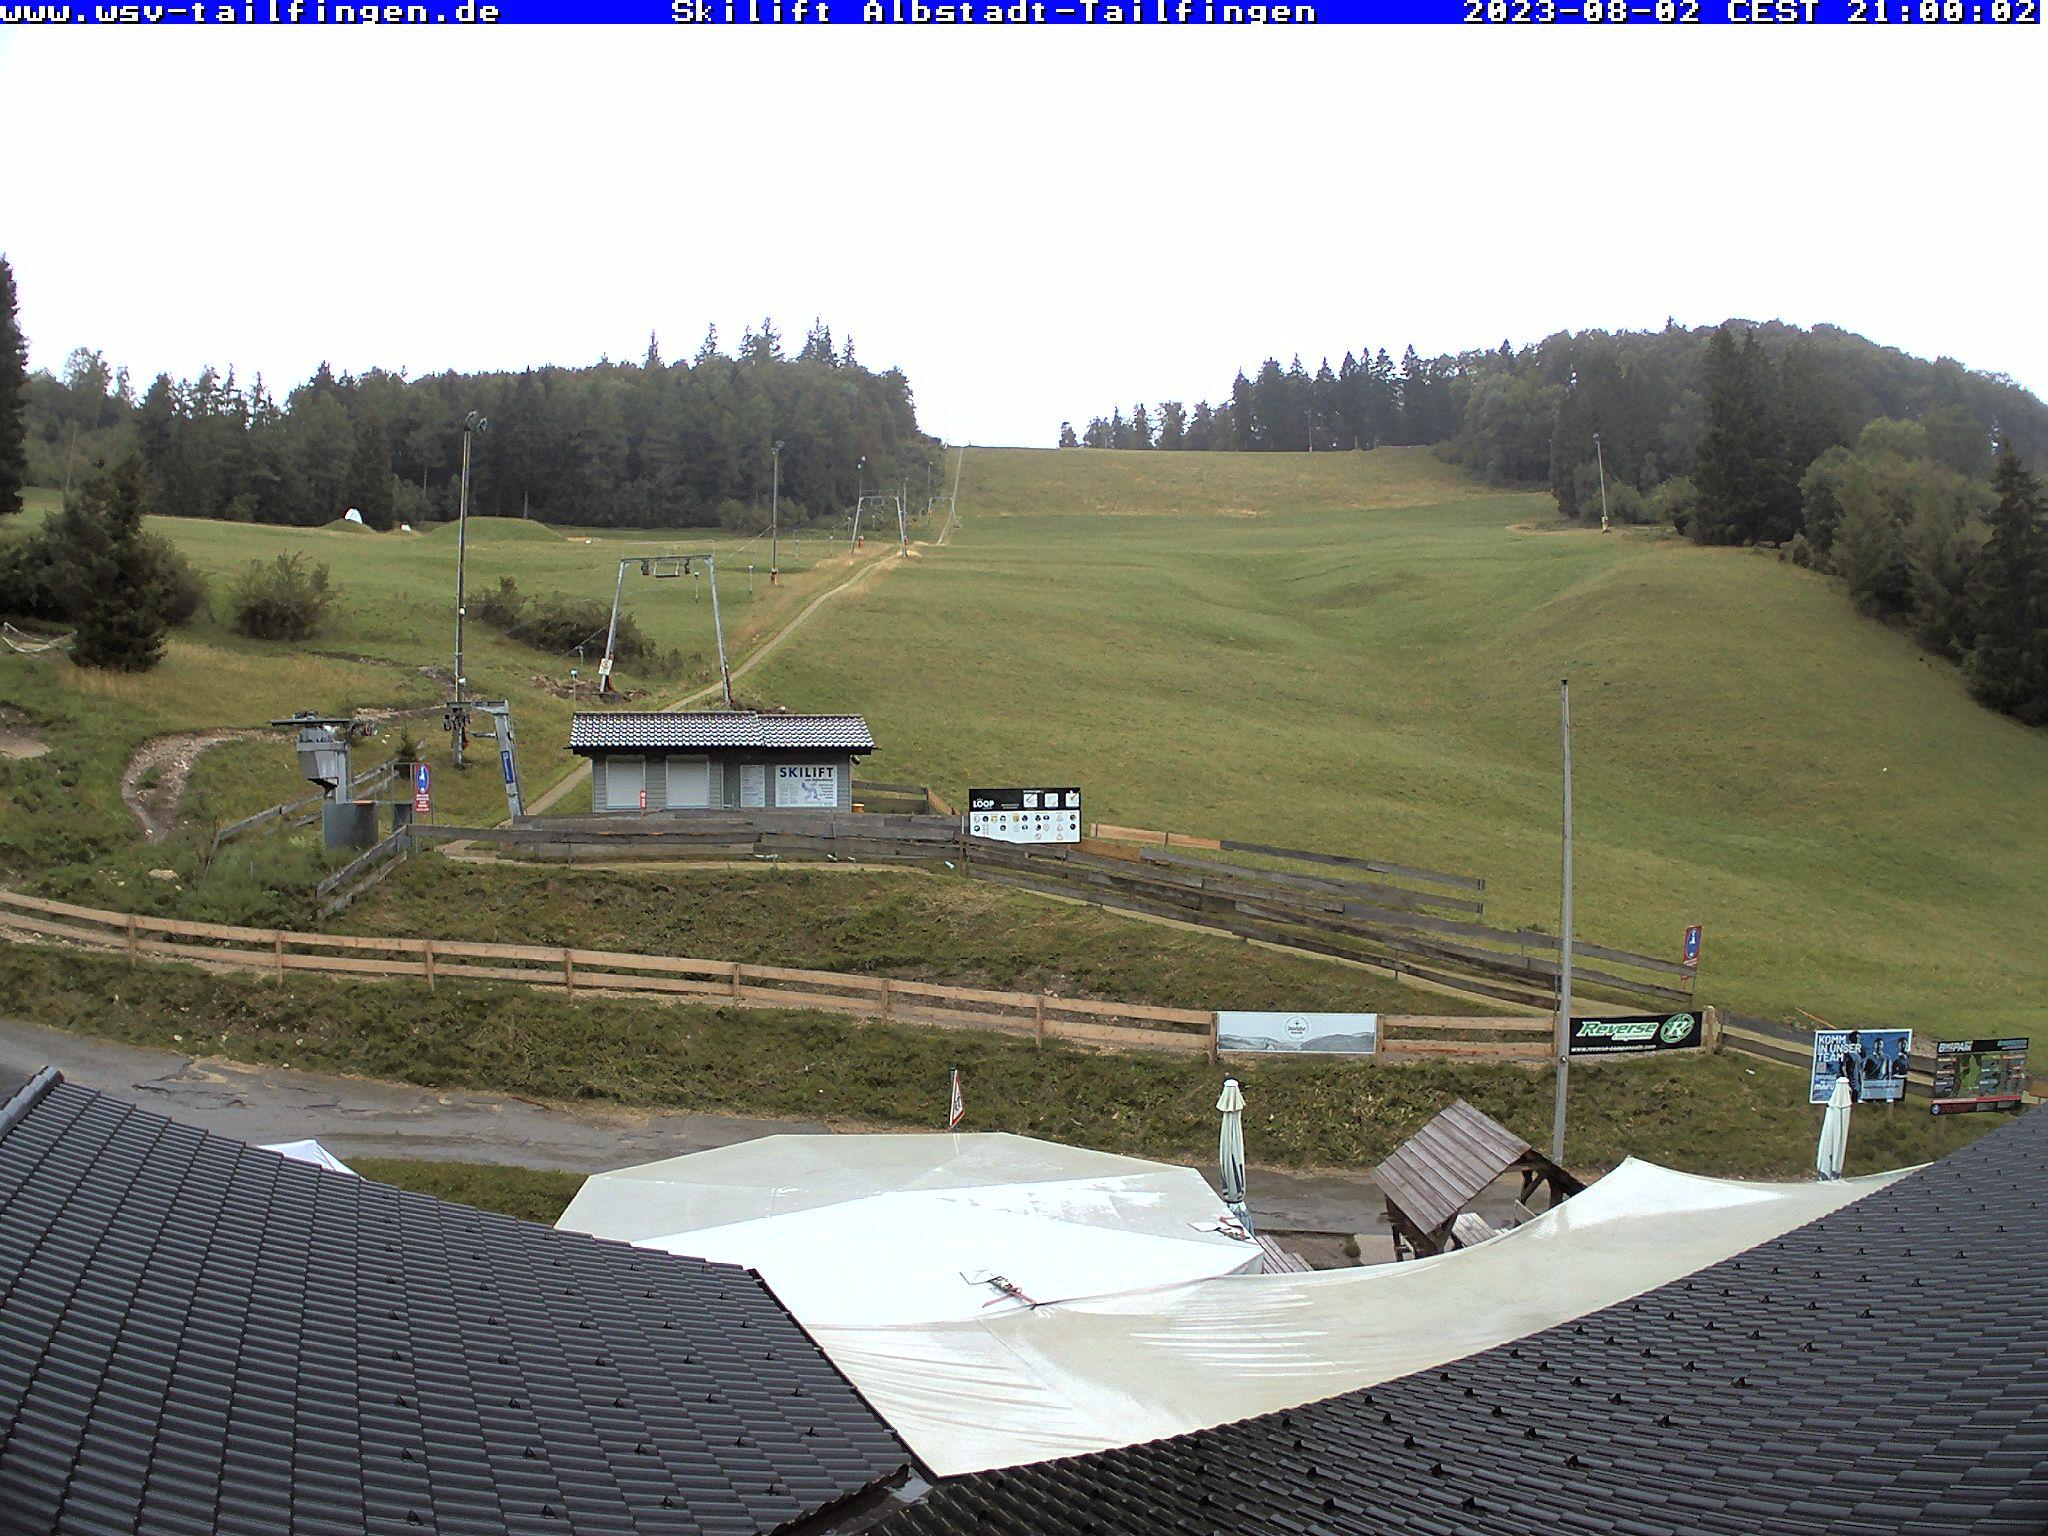 Webcam-Foto 21:00 Uhr / Skilift Albstadt-Tailfingen